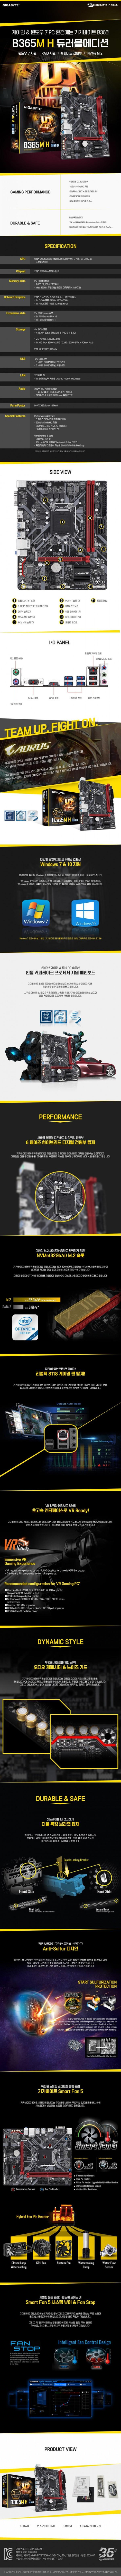 [GIGABYTE]  B365M H 듀러블에디션 제이씨현 (벌크) (인텔B365/M-ATX)